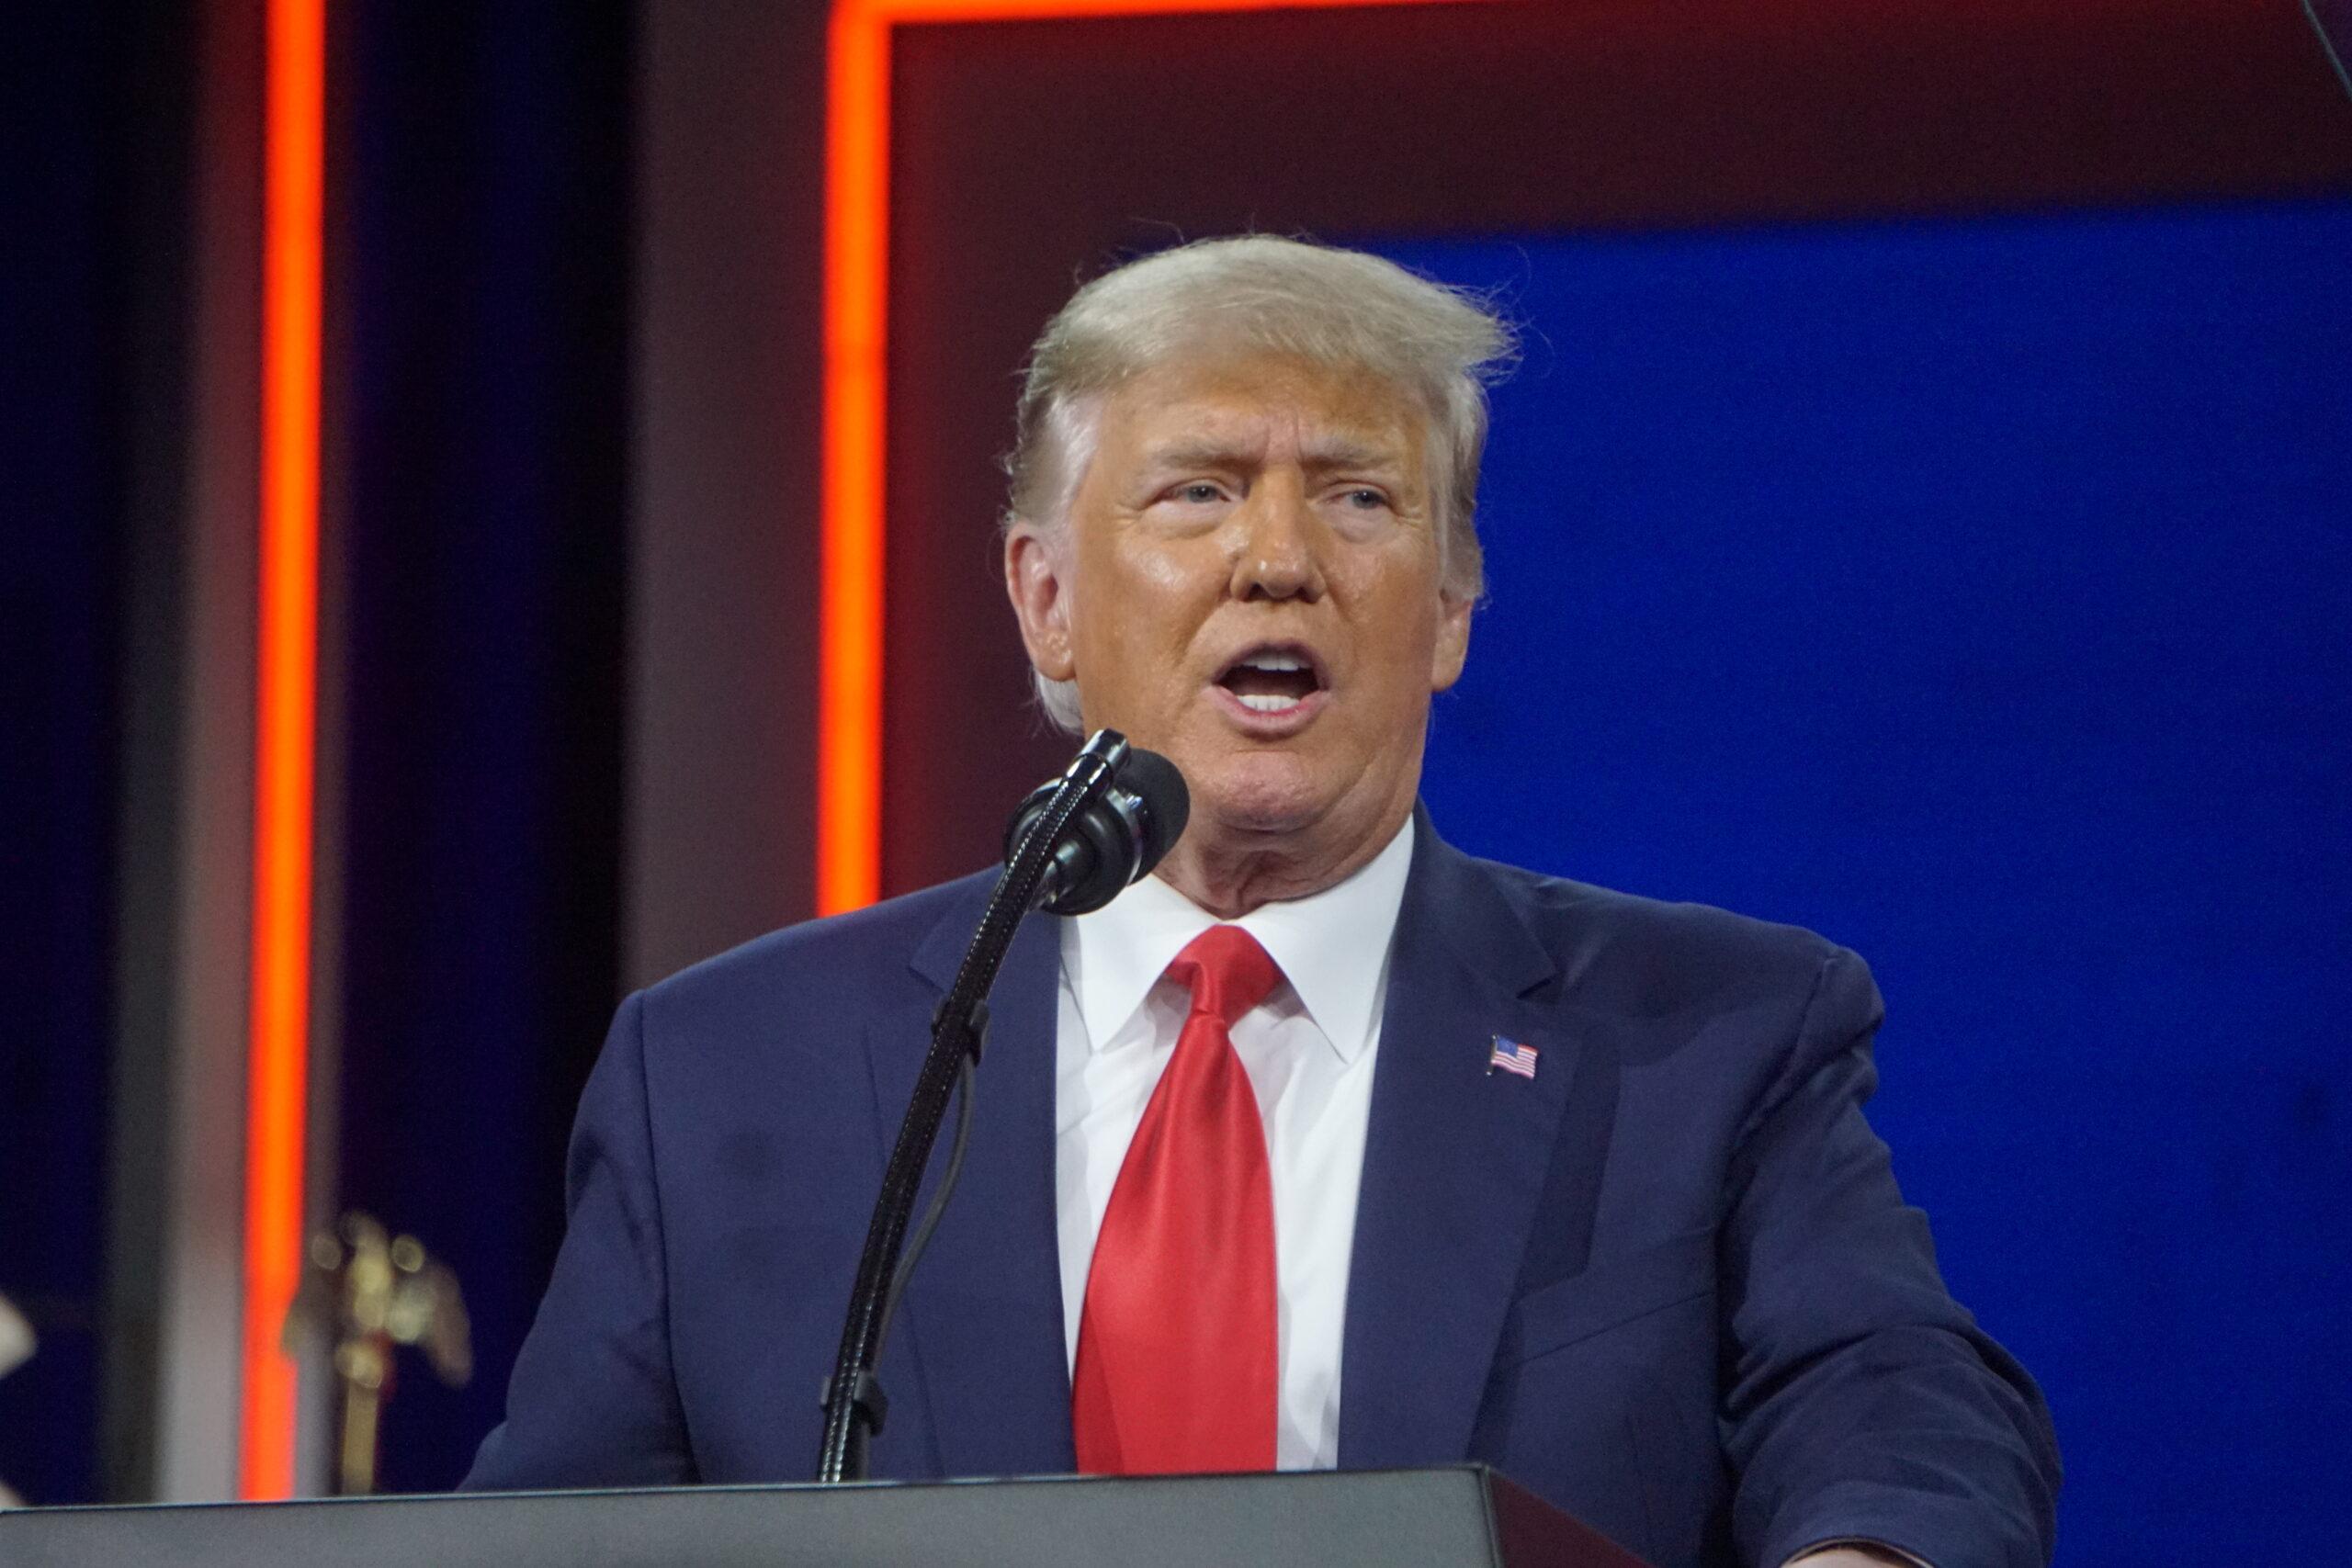 Trump Teases Lara Trump Potential Senatorial Run